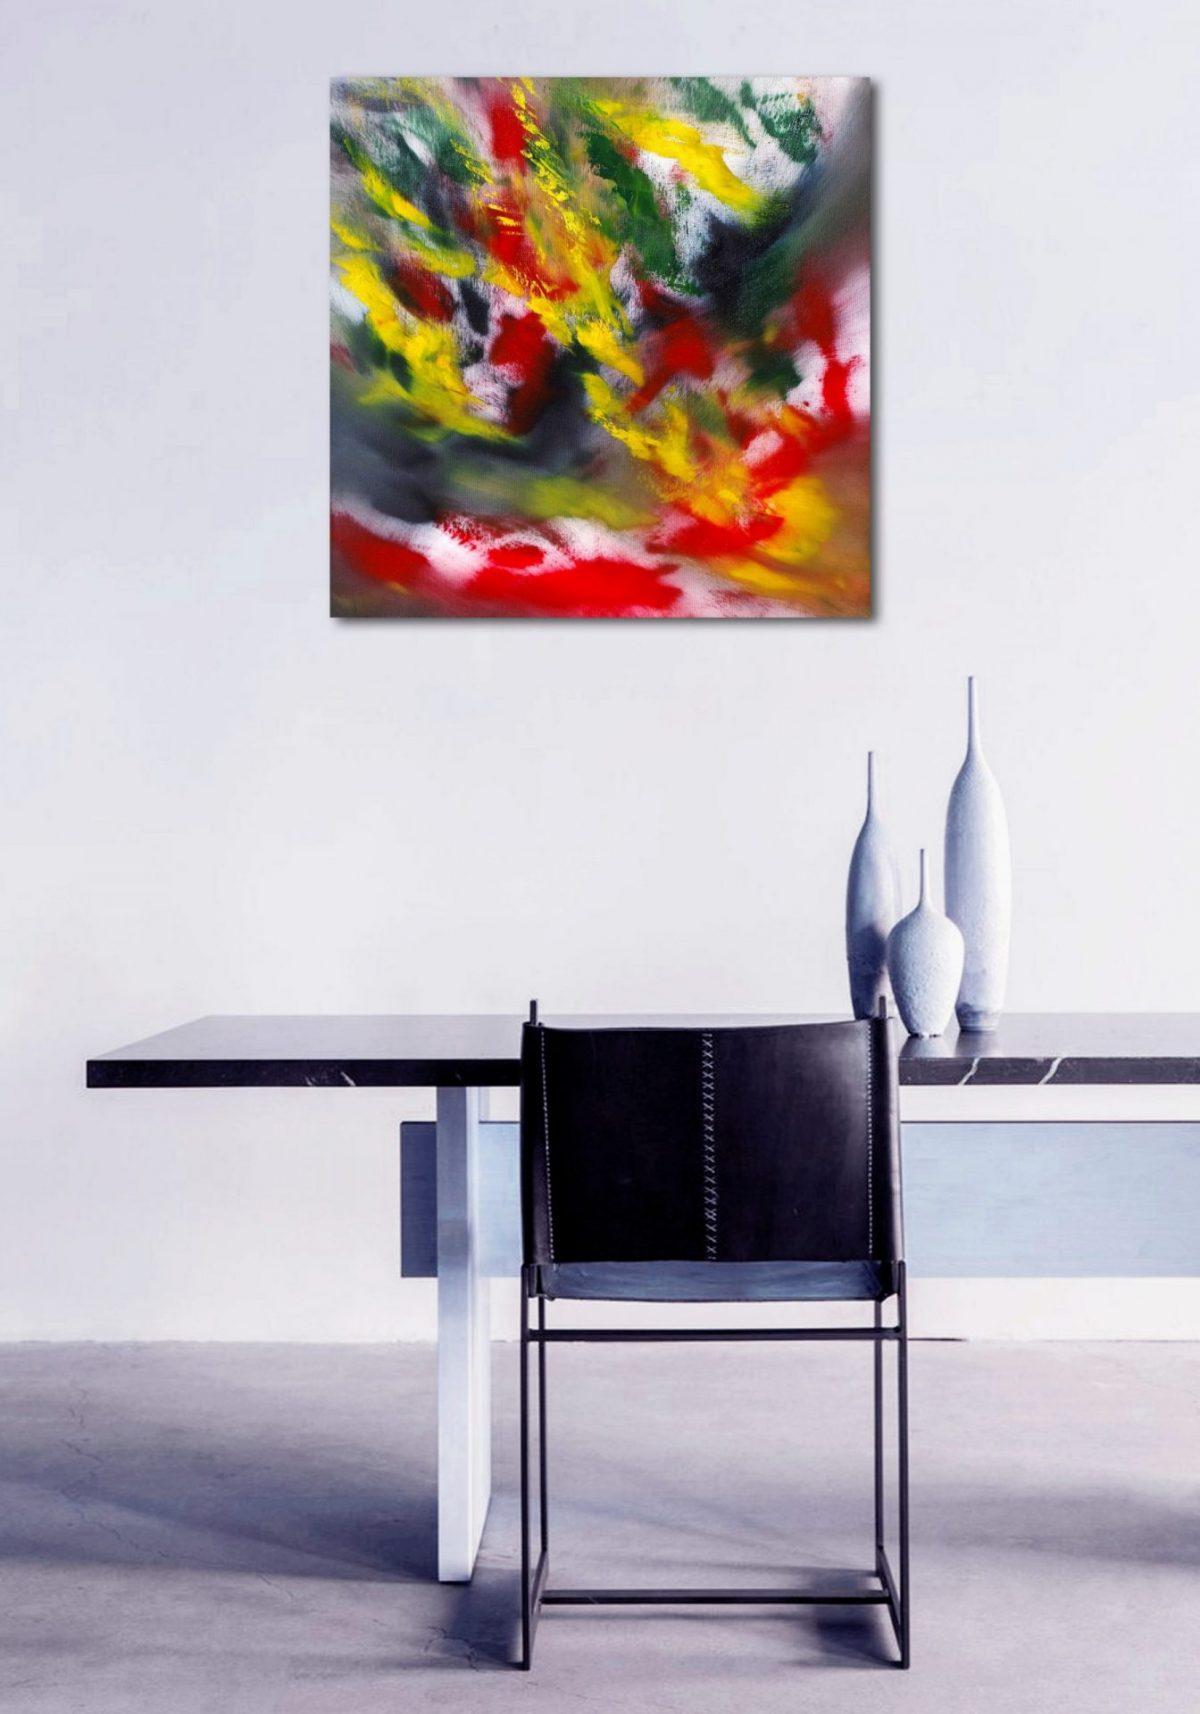 Malinconic carnival 2018 60x60 quadro moderno in vendita onlineMalinconic carnival 2018 60x60 quadro moderno in vendita online